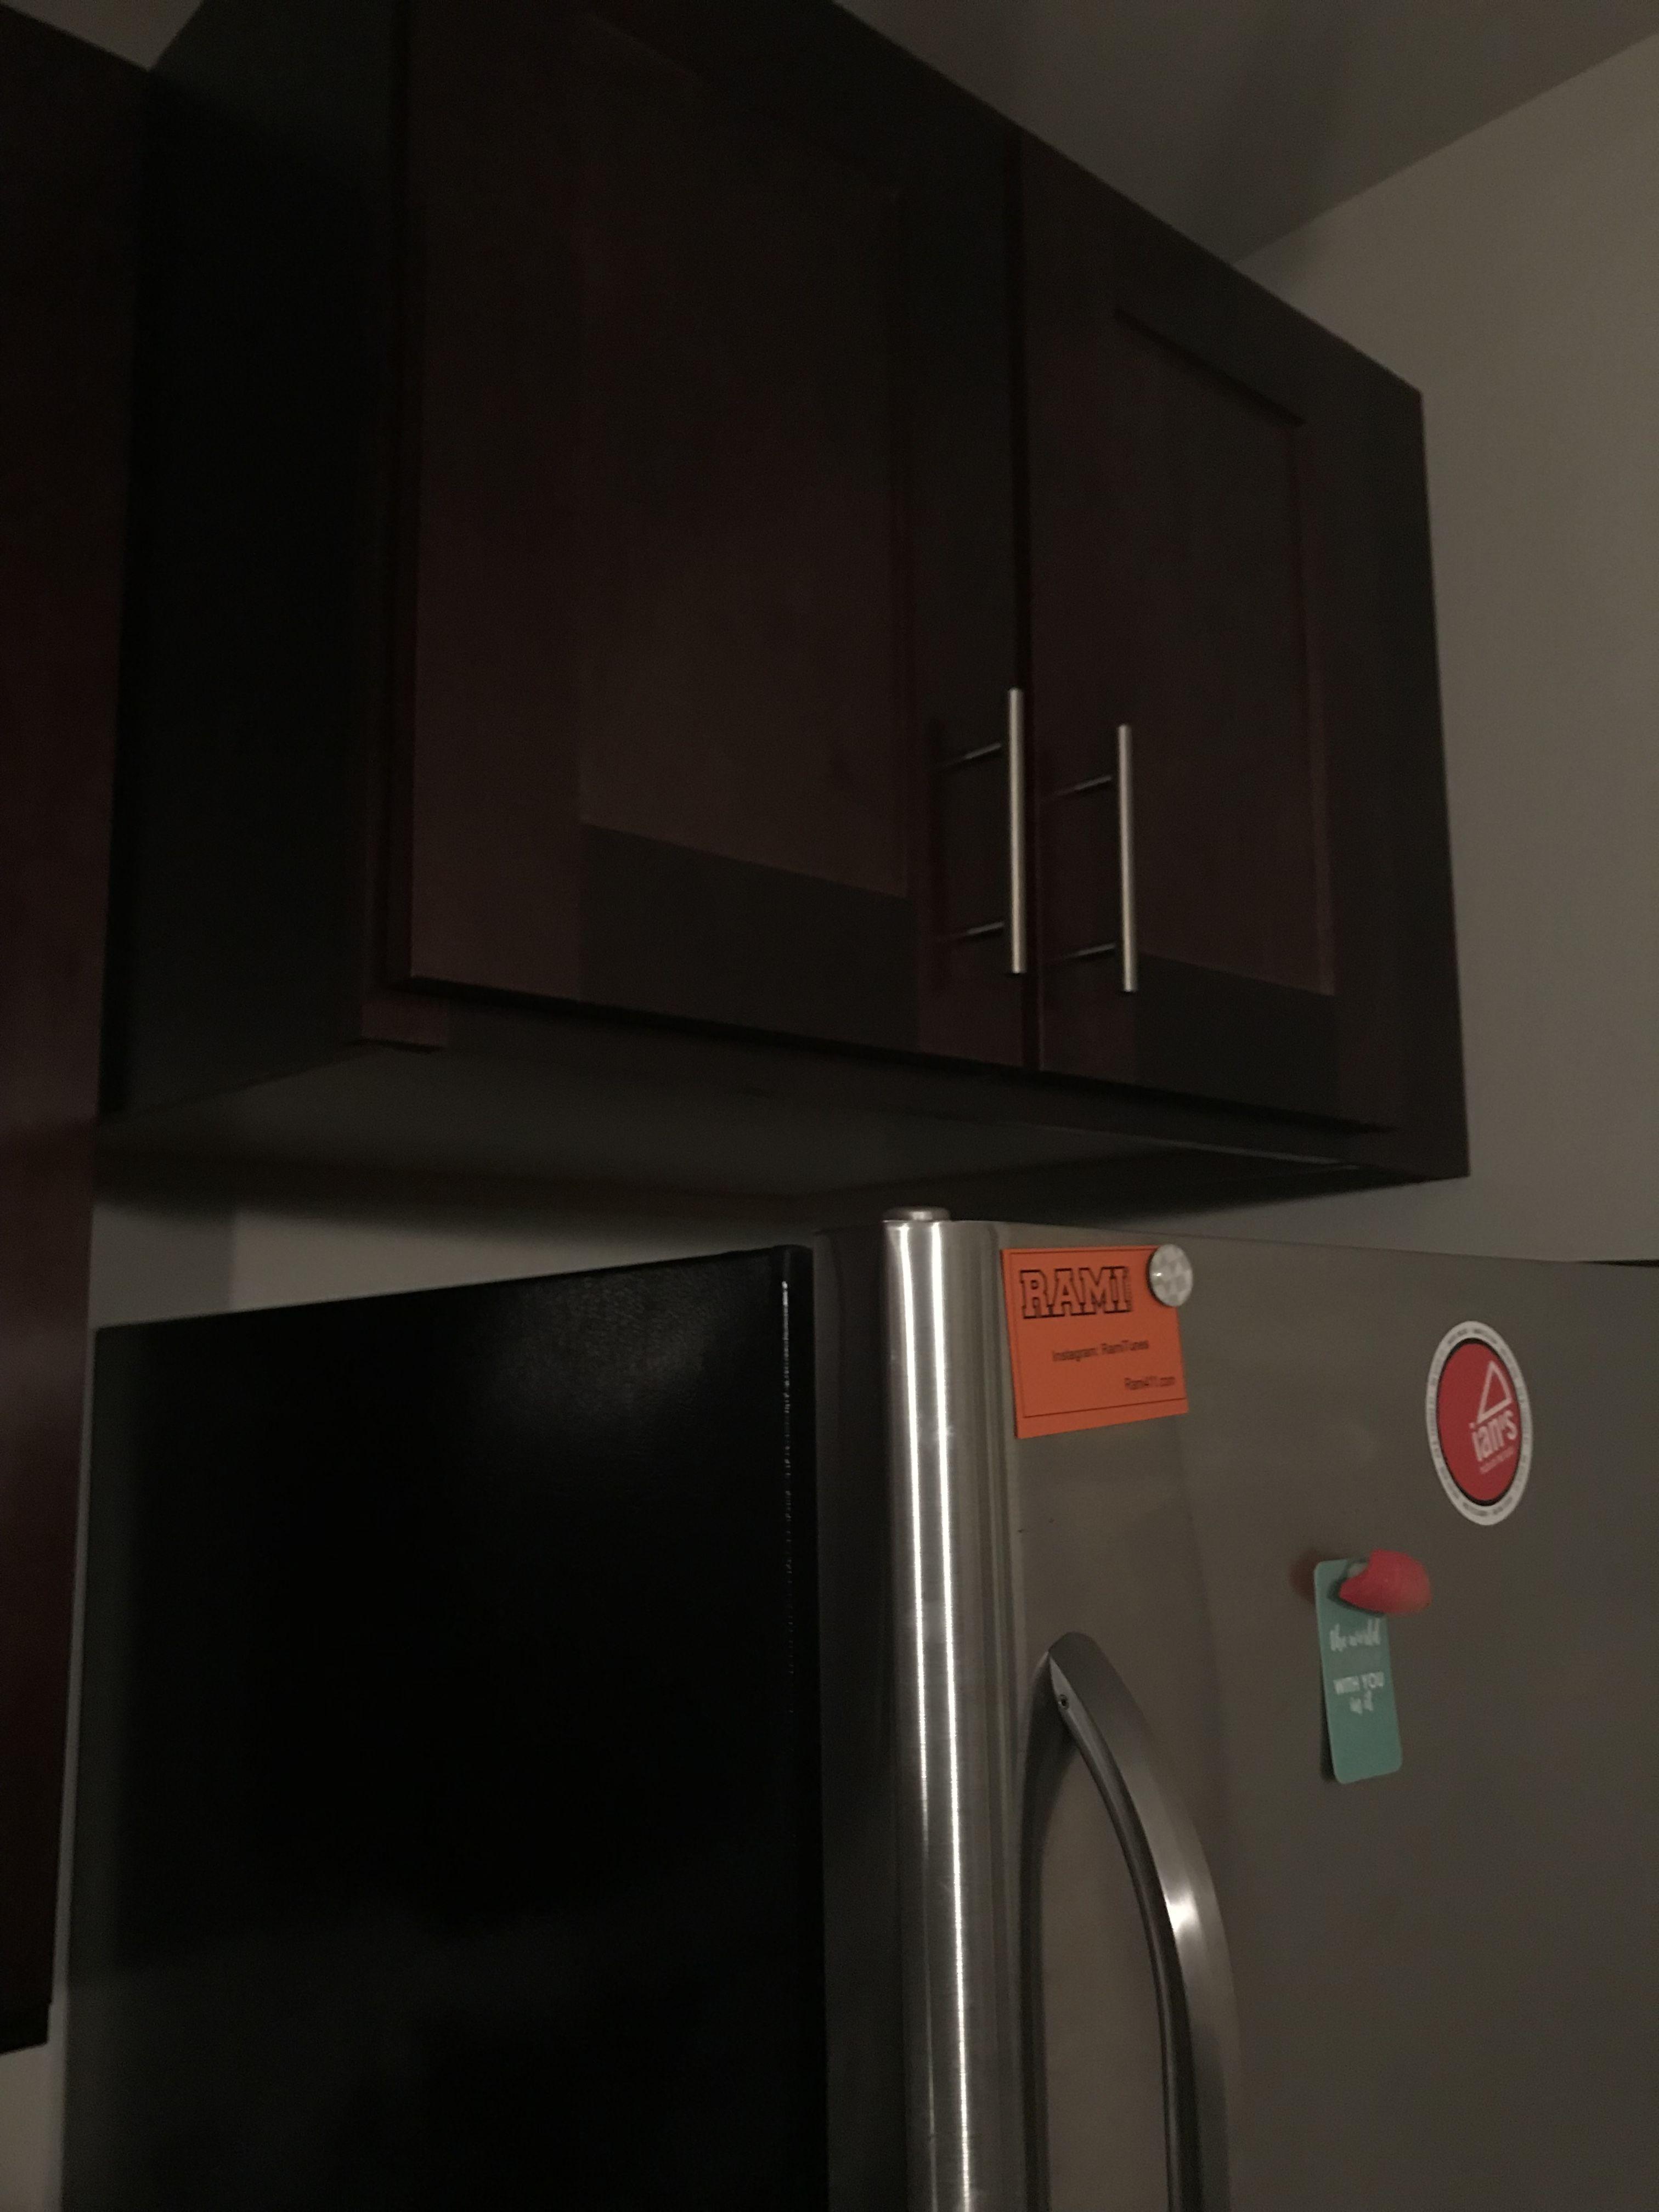 Deranged 5 Gap between fridge and Home